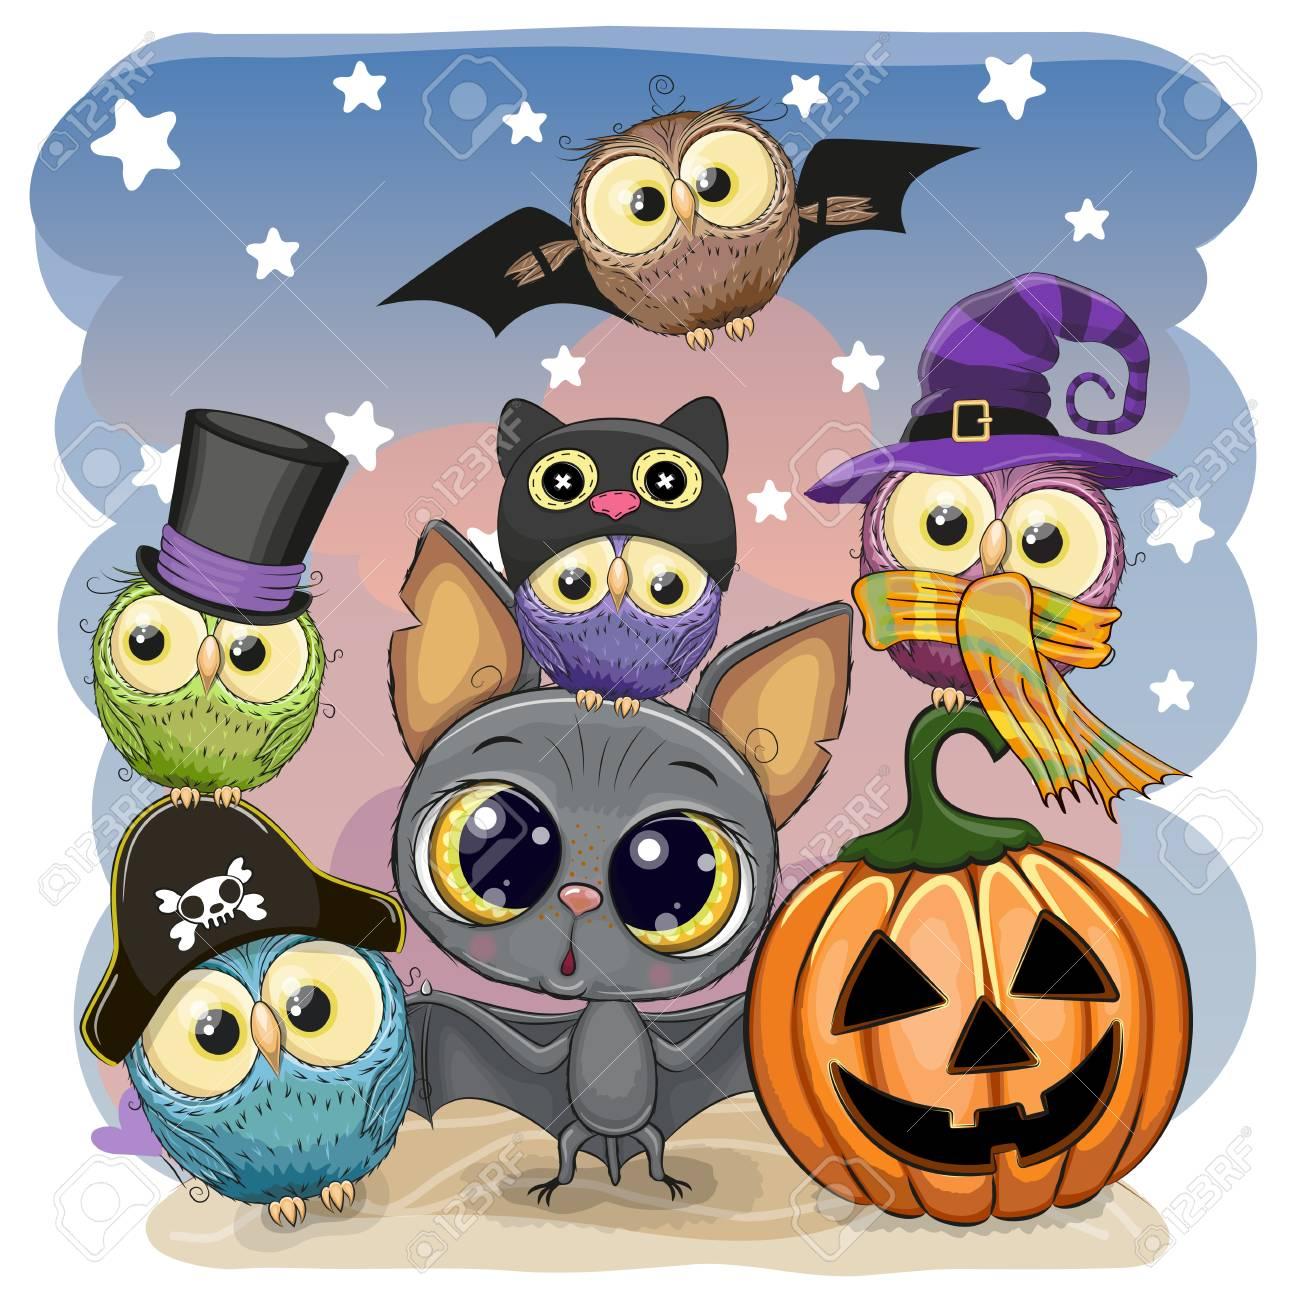 Greeting Halloween Card Cute Cartoon Bat with pumpkin and five owls - 110704631